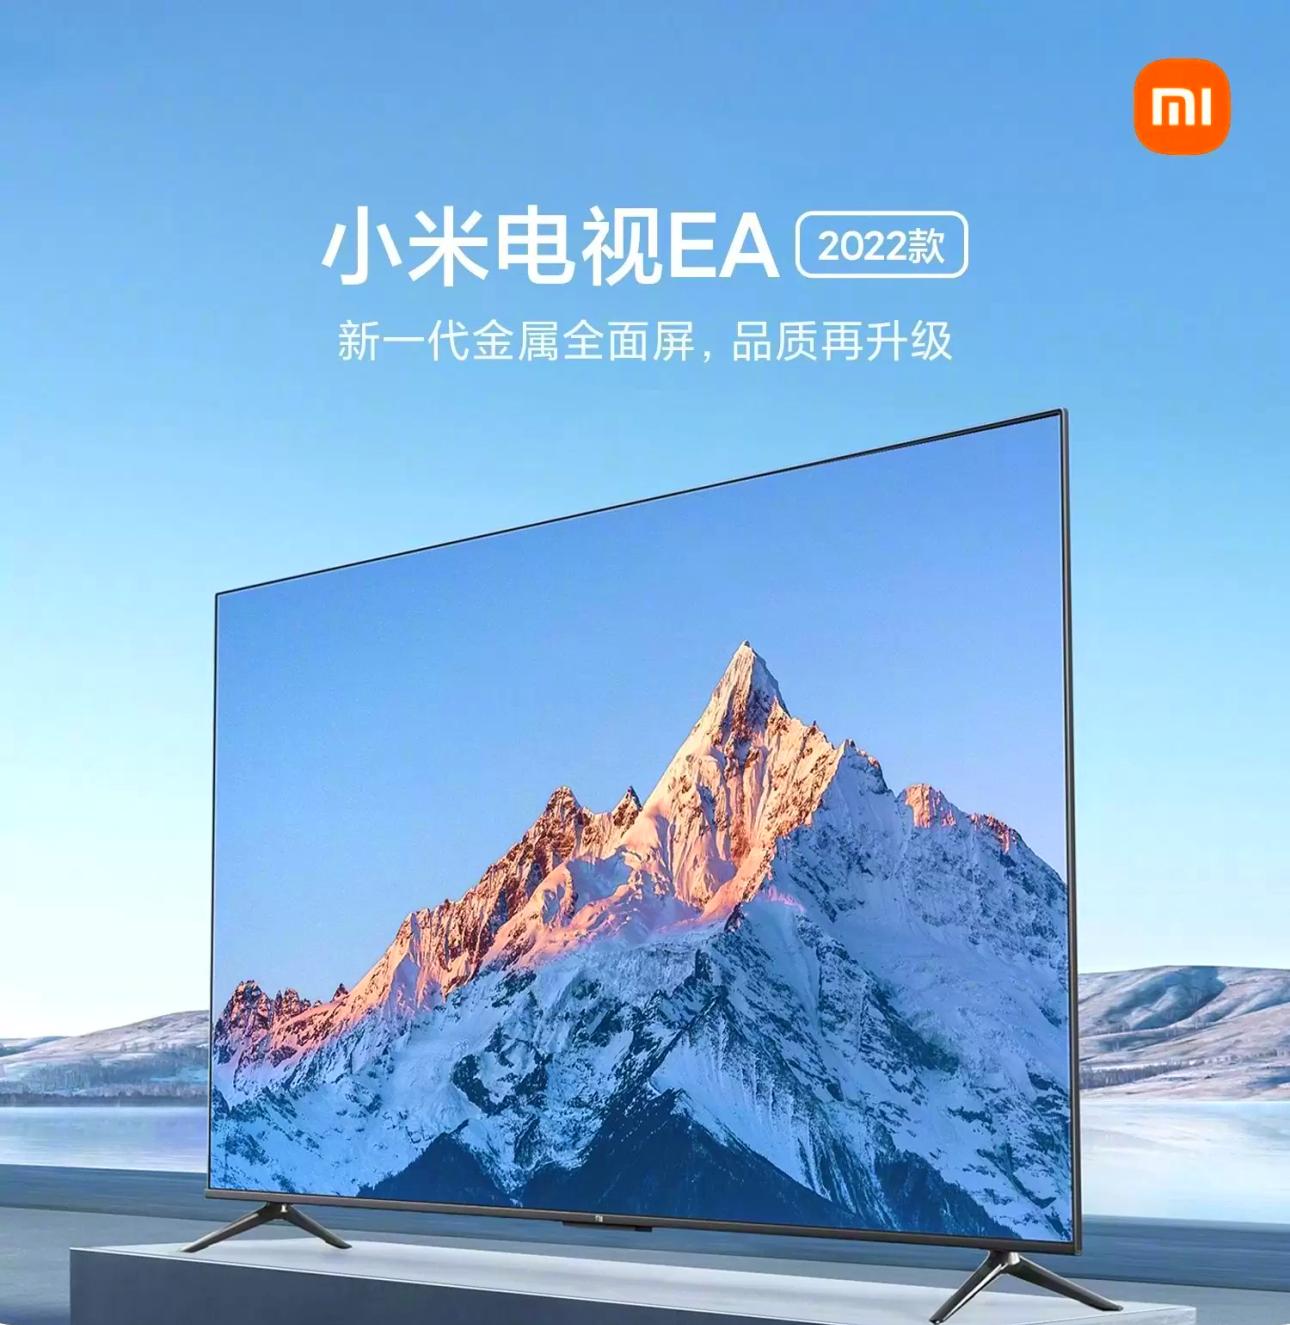 Xiaomi Predstavila Novuyu Linejku Smart Televizorov Mi Tv Ea 2022 2